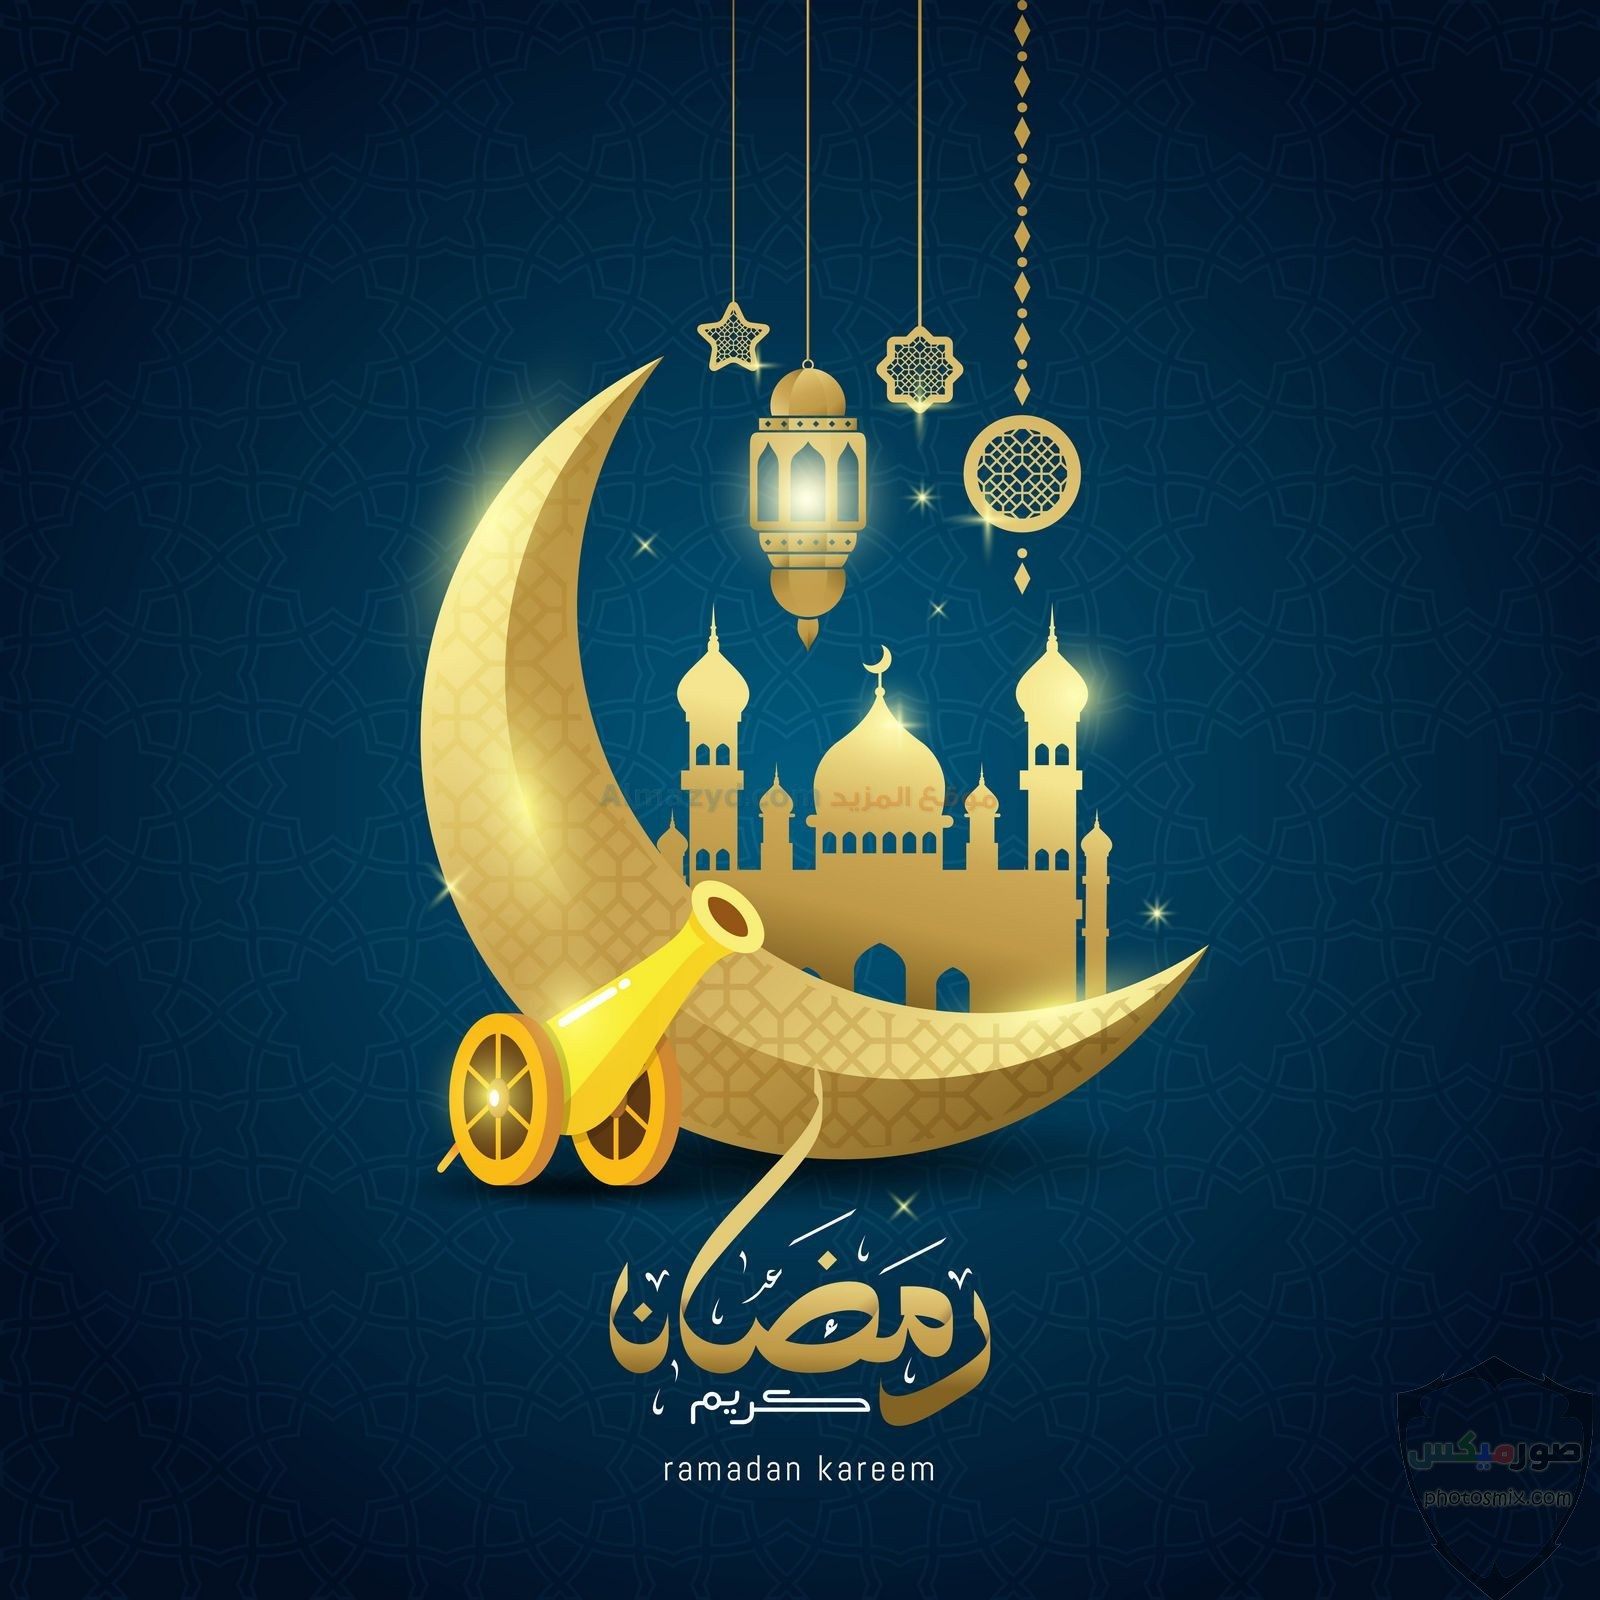 صور رمضان 2020 أجمل صور فوانيس رمضان 2021 بطاقات تهنئة لرمضان تهنئة رمضان بالأسماء 19